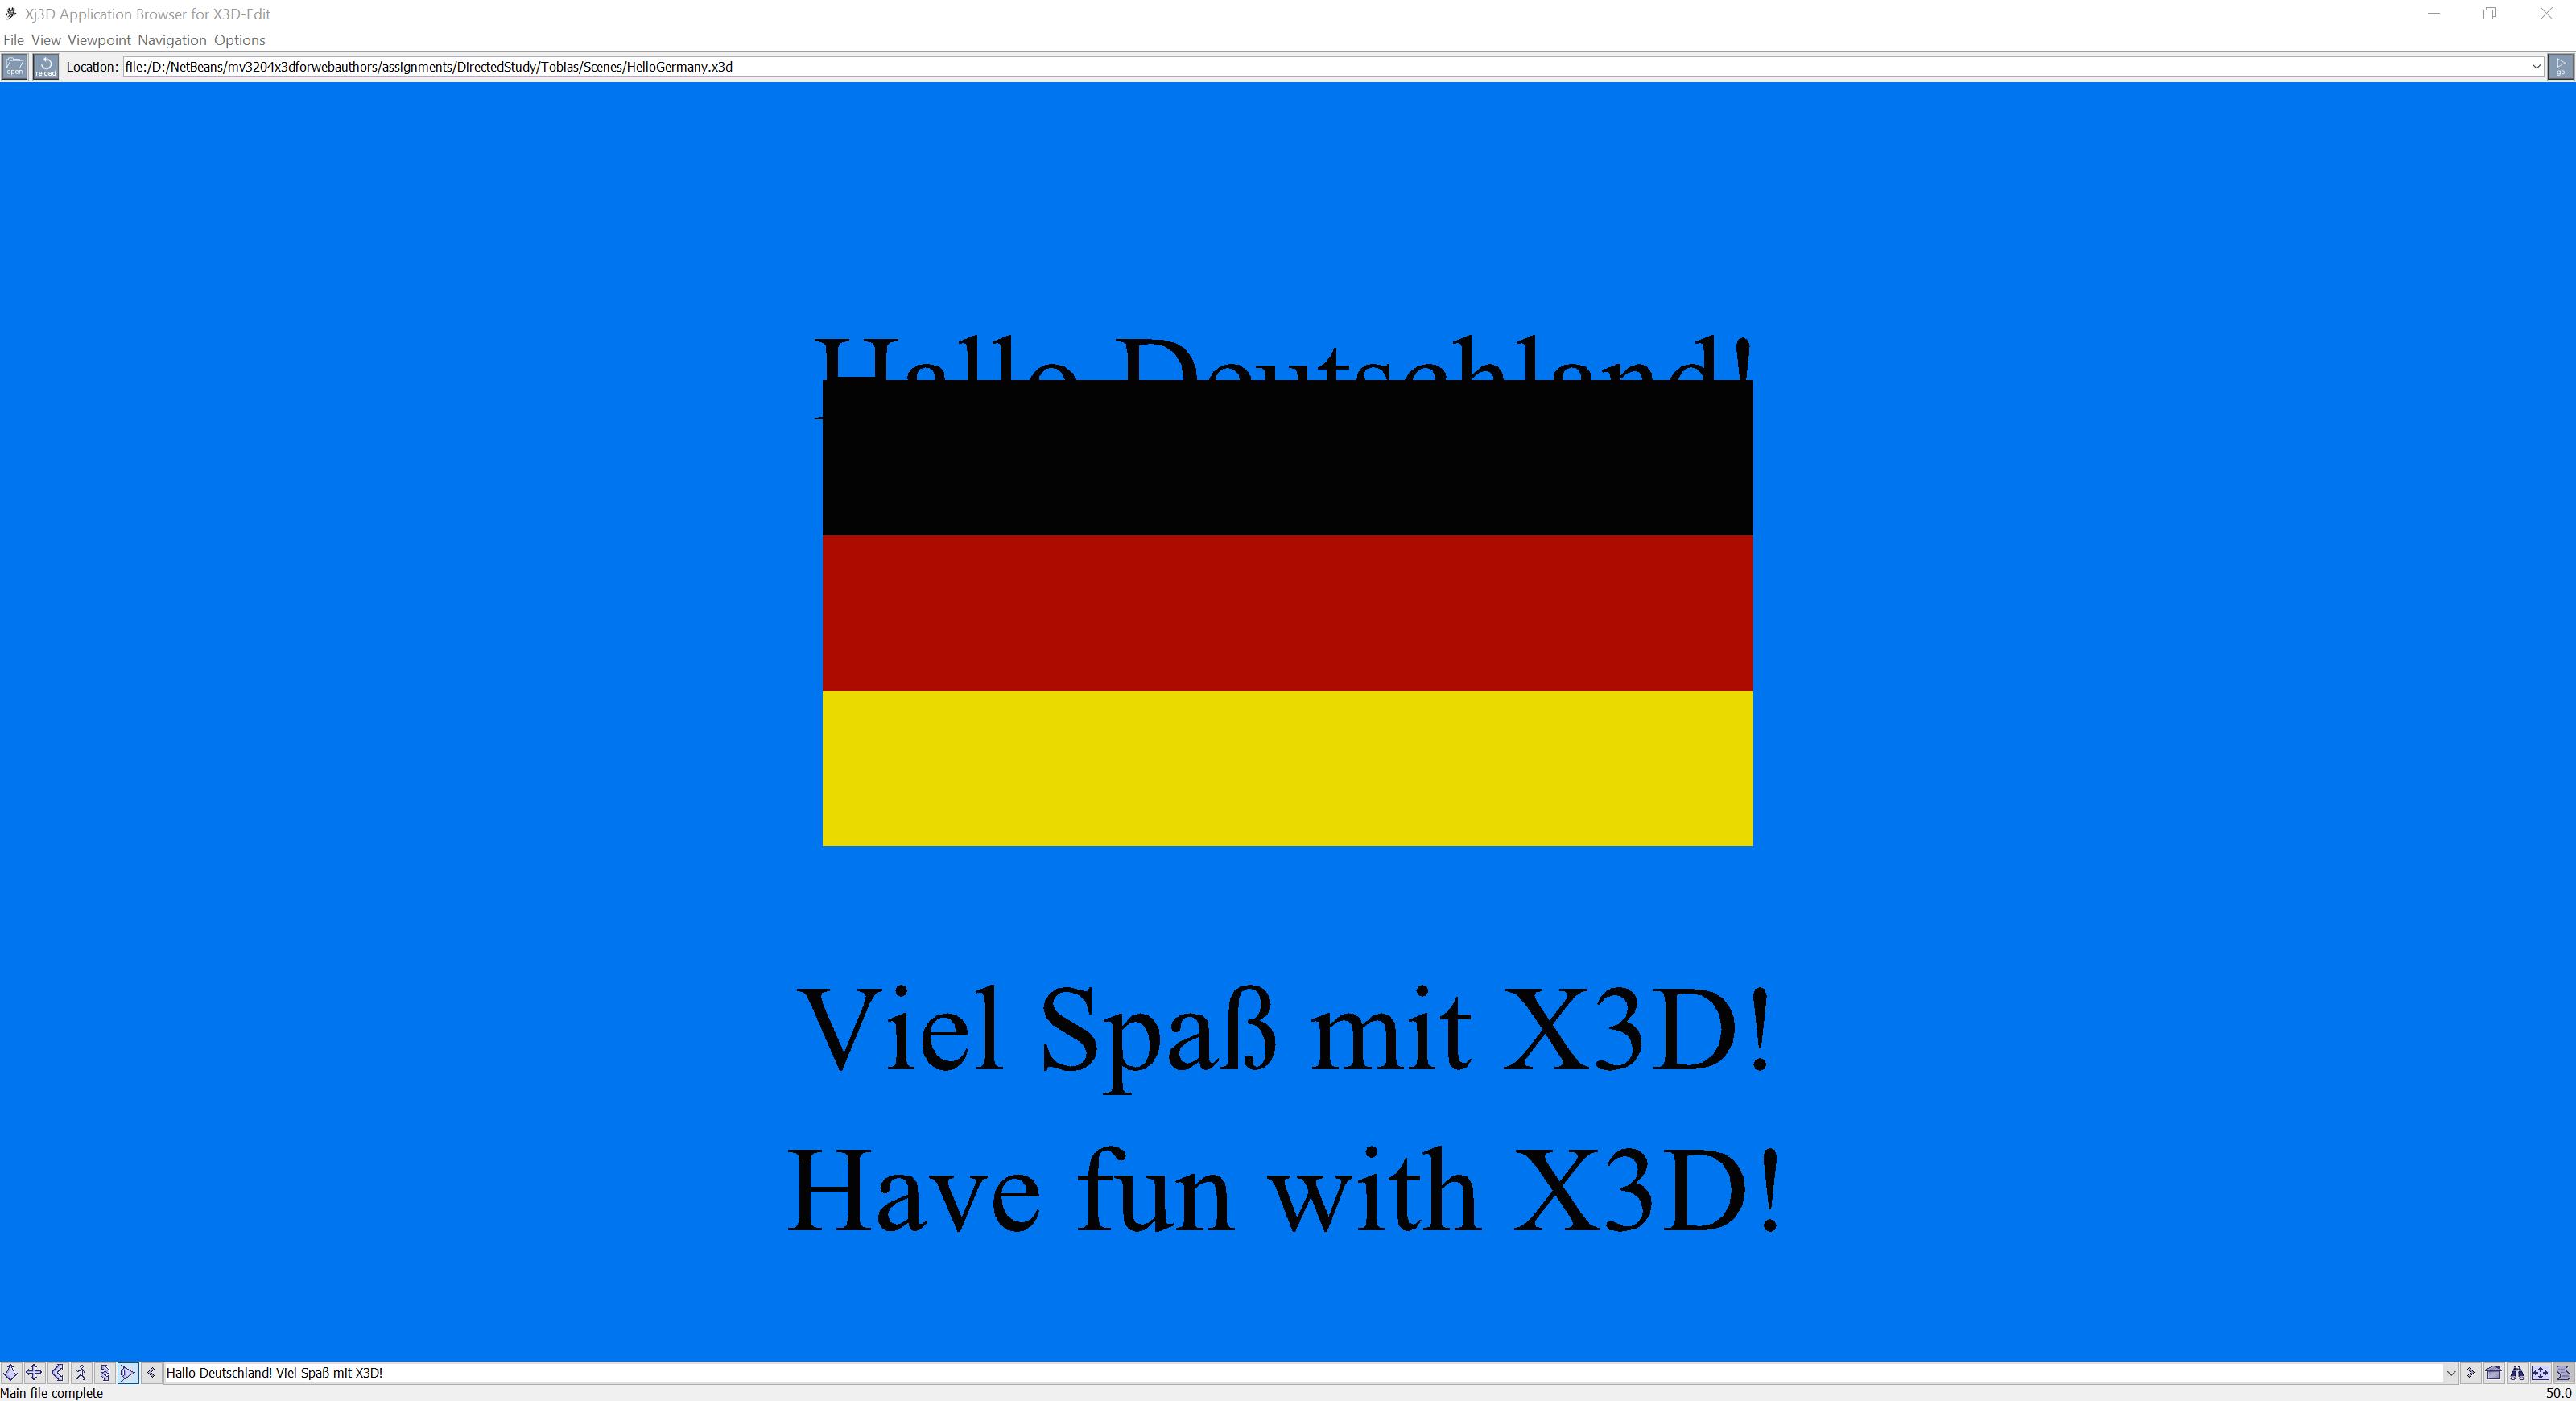 BrennenstuhlTobias/Screenshots/Player/Hello Germany/HelloGermany.Xj3D Plugin.png